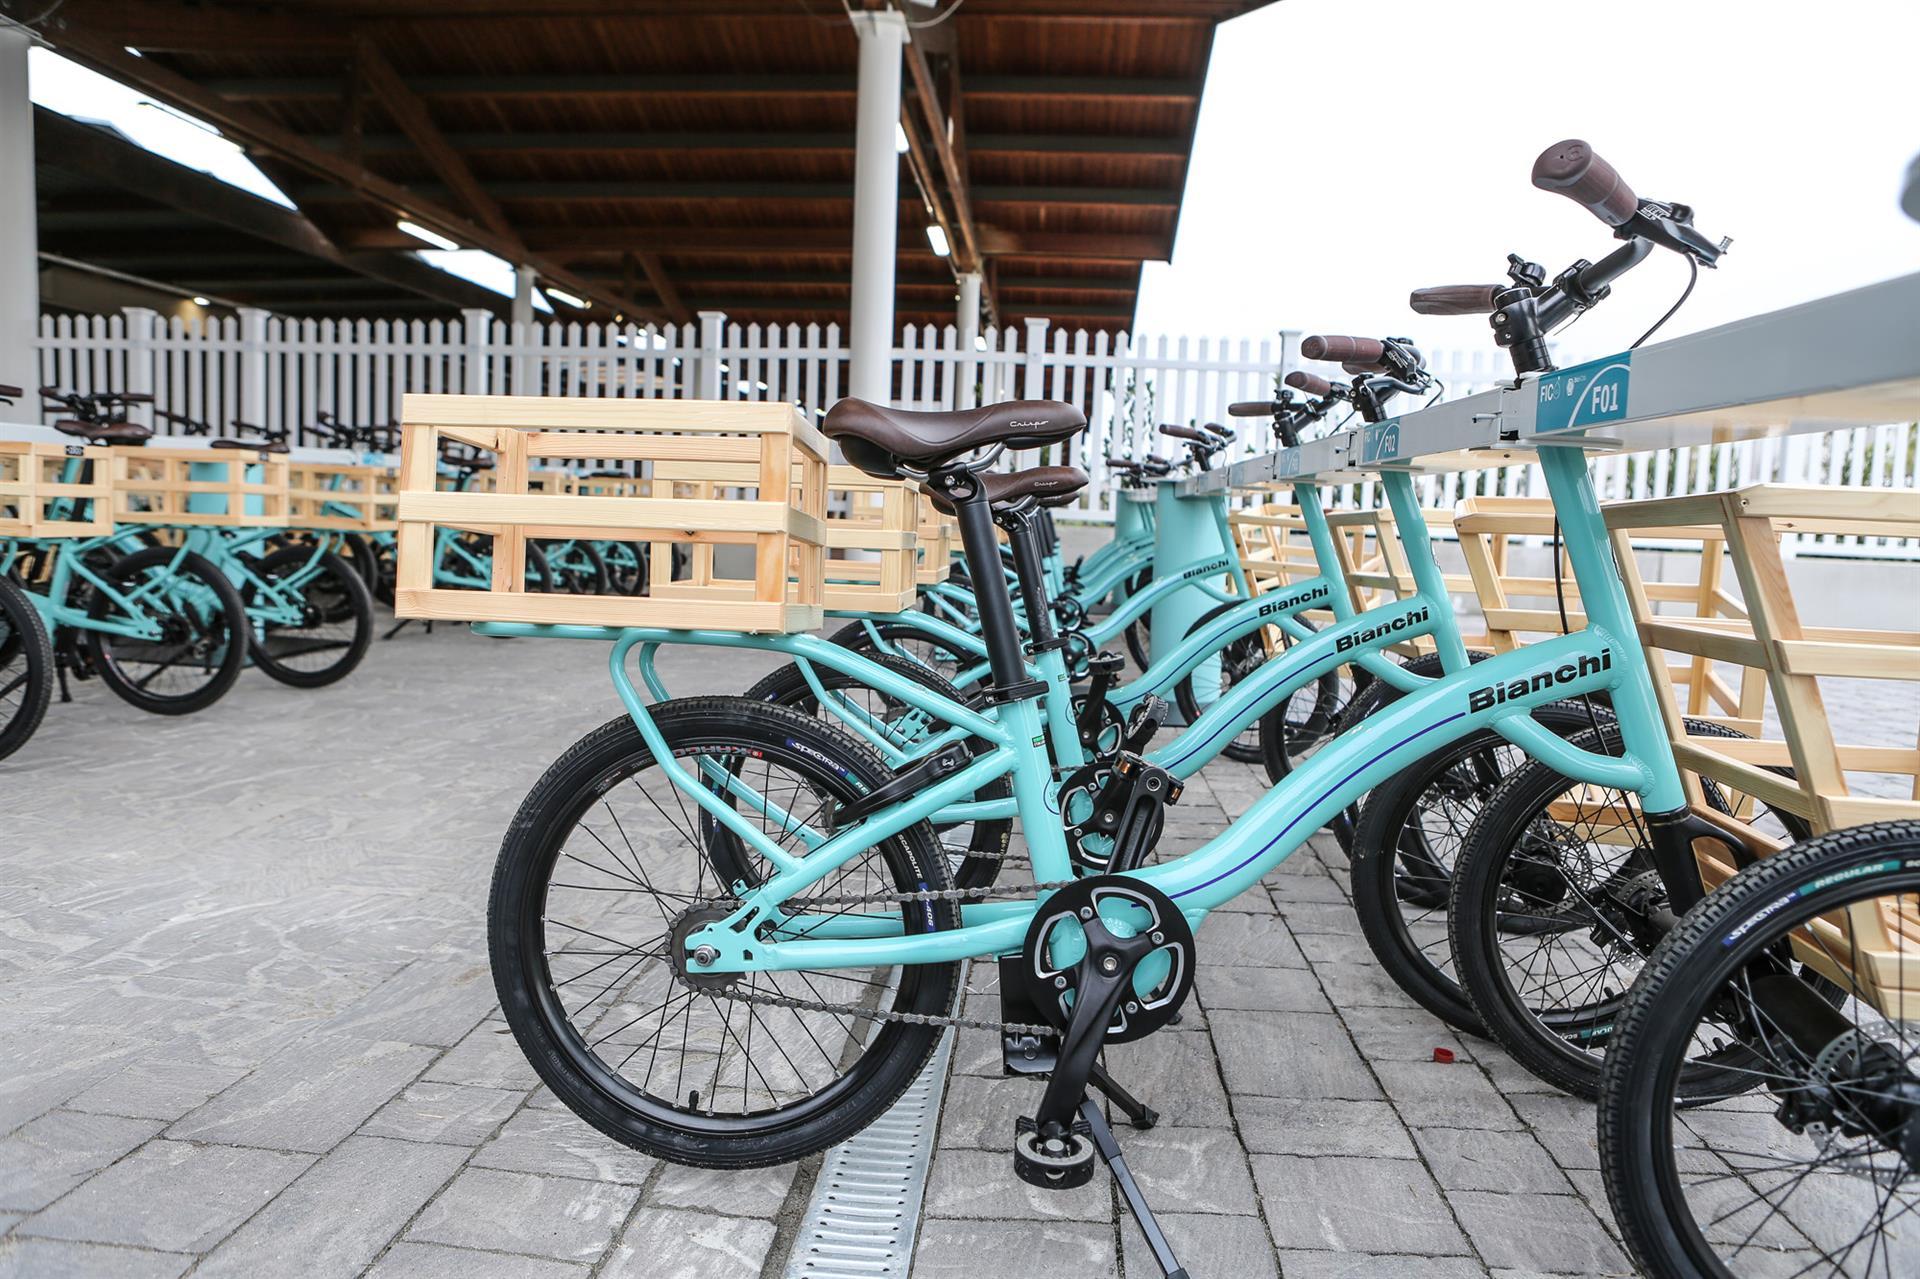 La Bianchi Fico shopping bike